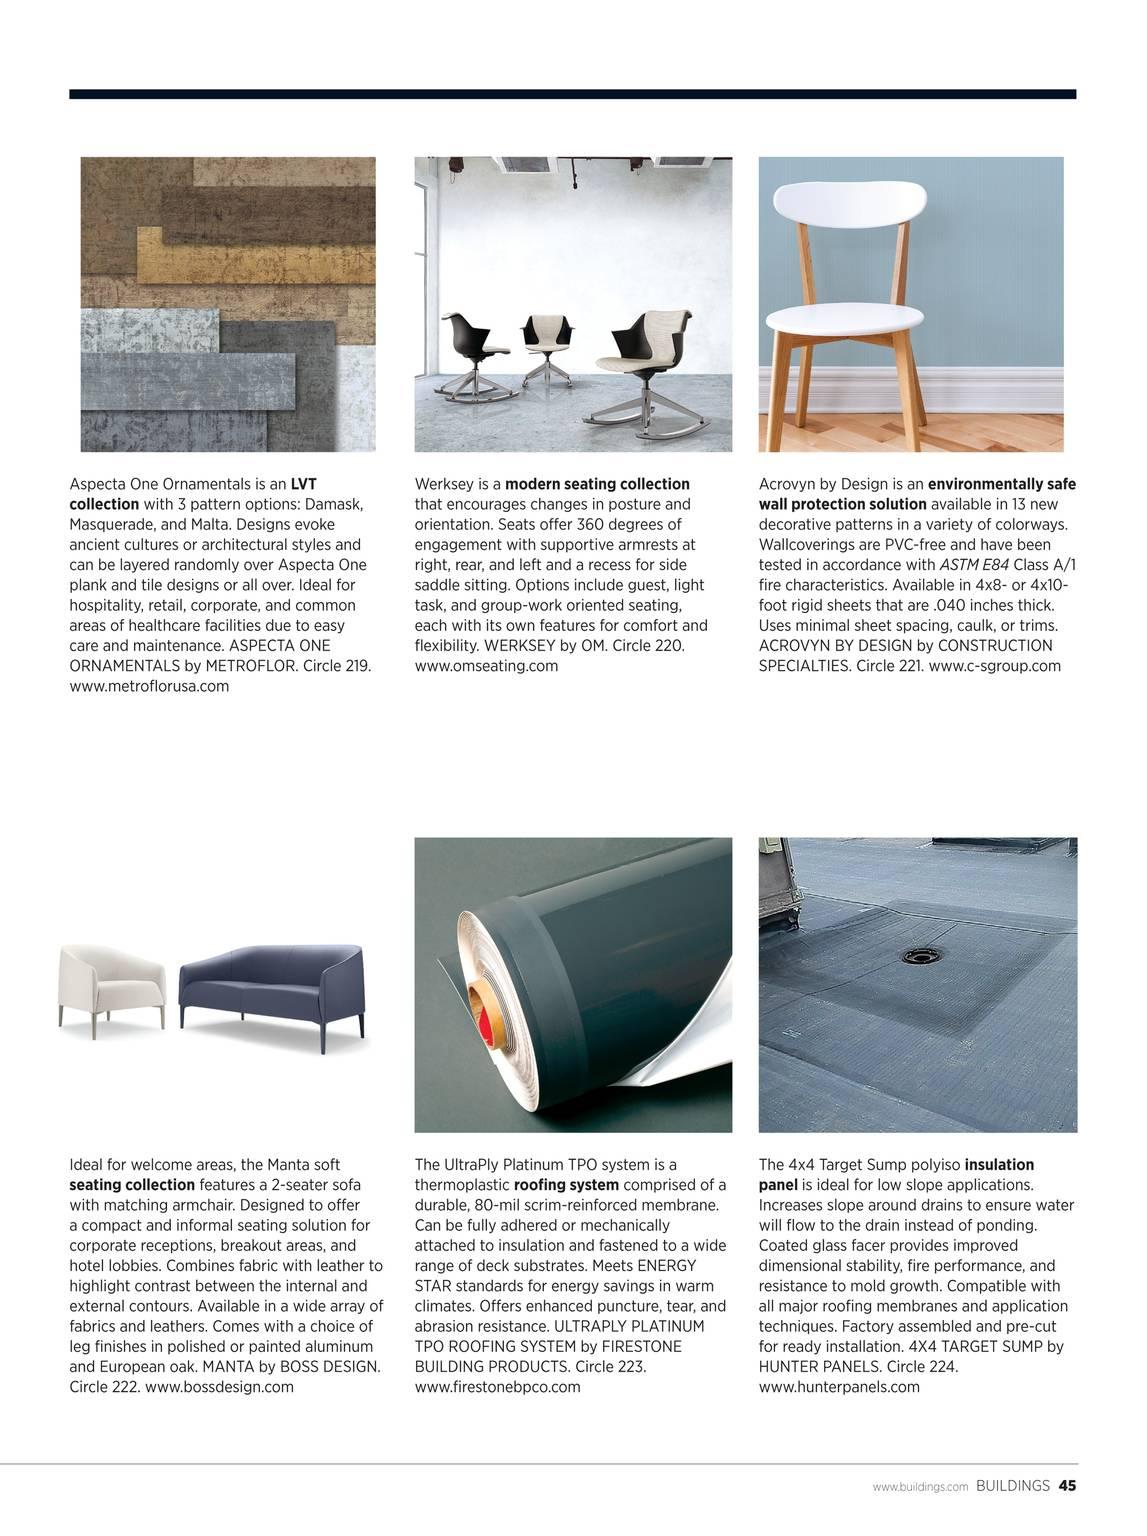 Buildings Magazine - November 2017 - page 46